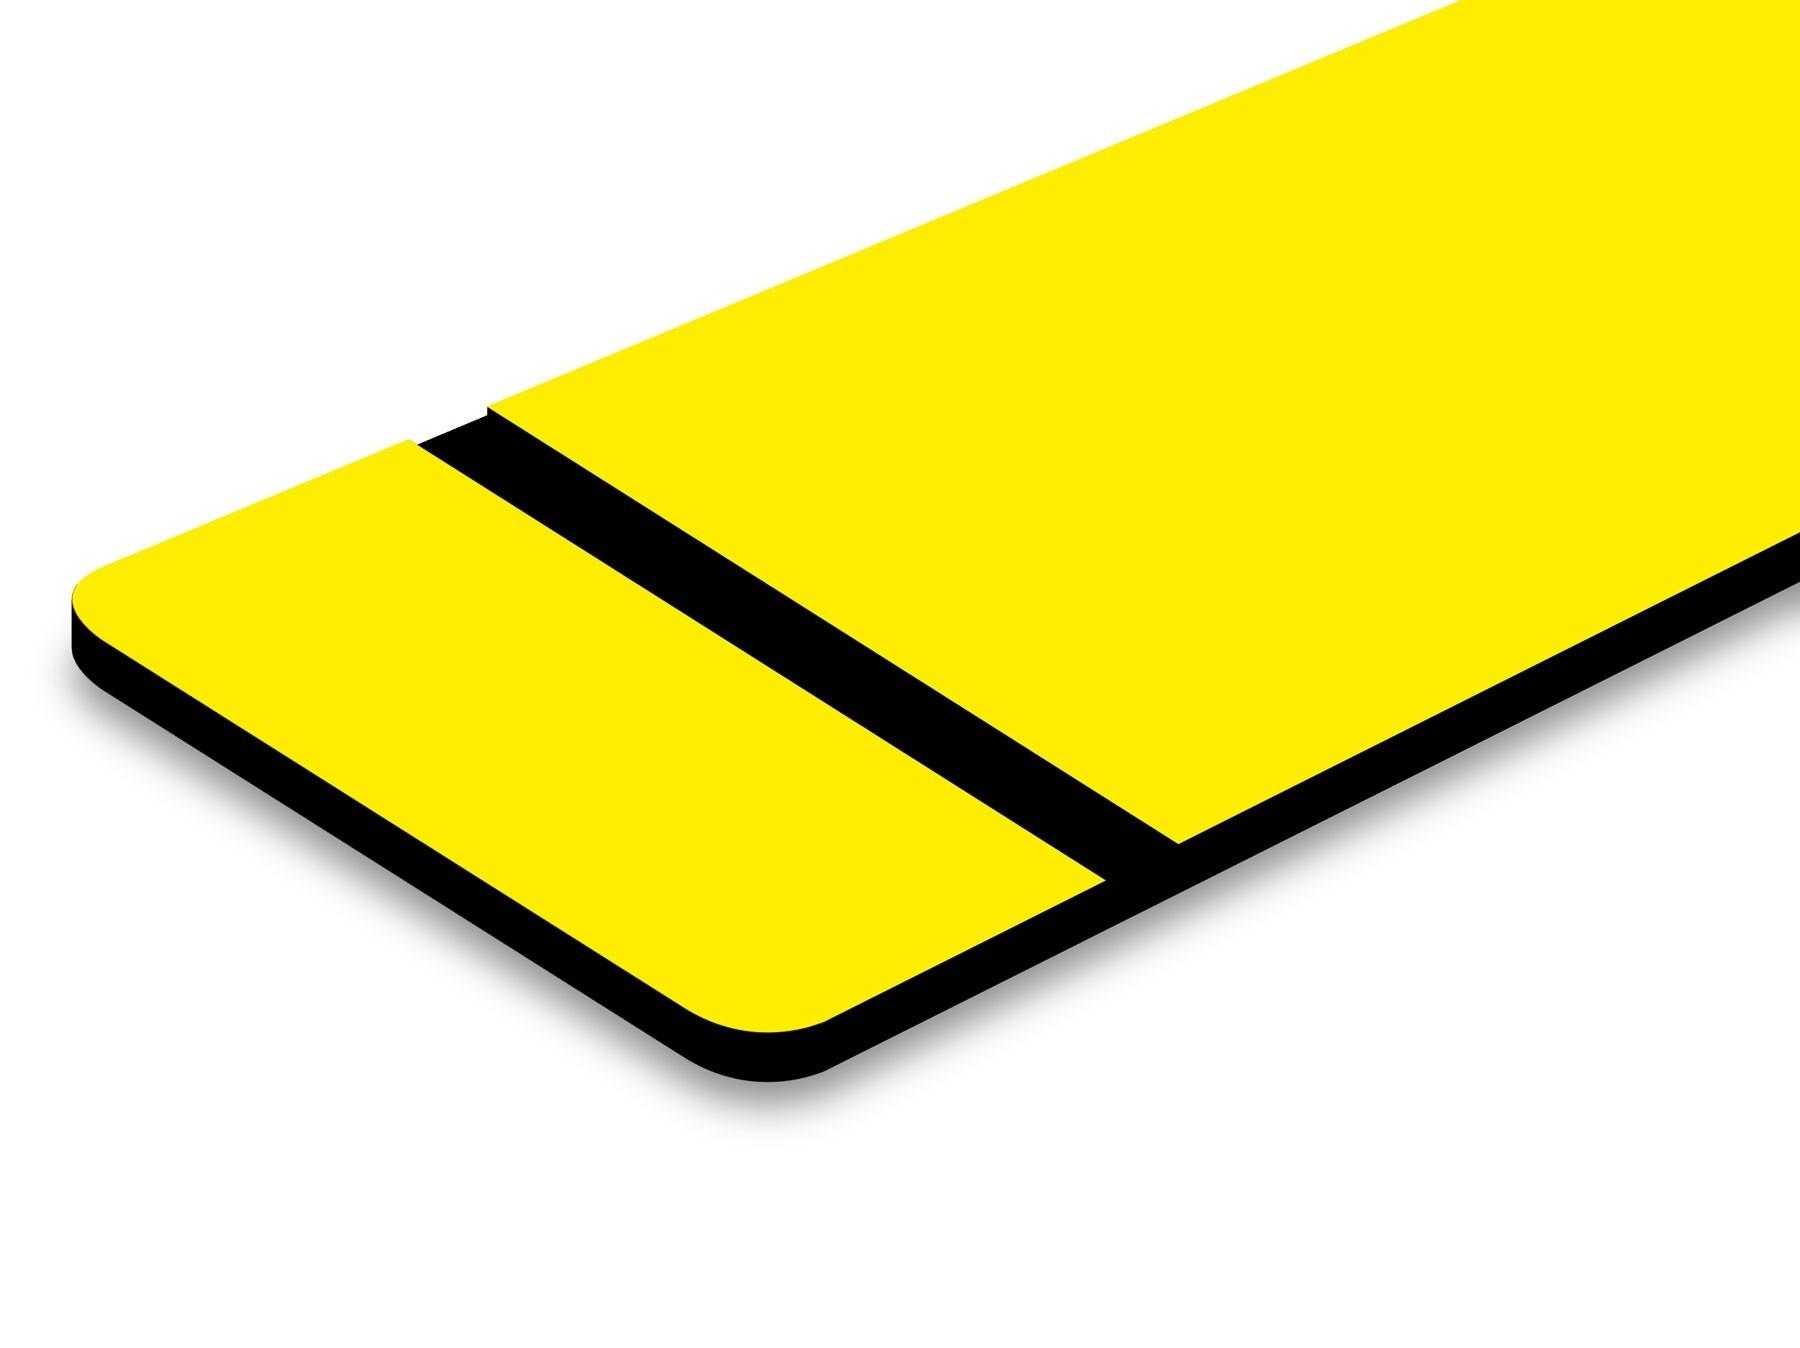 TroLase, Yellow/Black, 2ply, 0.8 mm